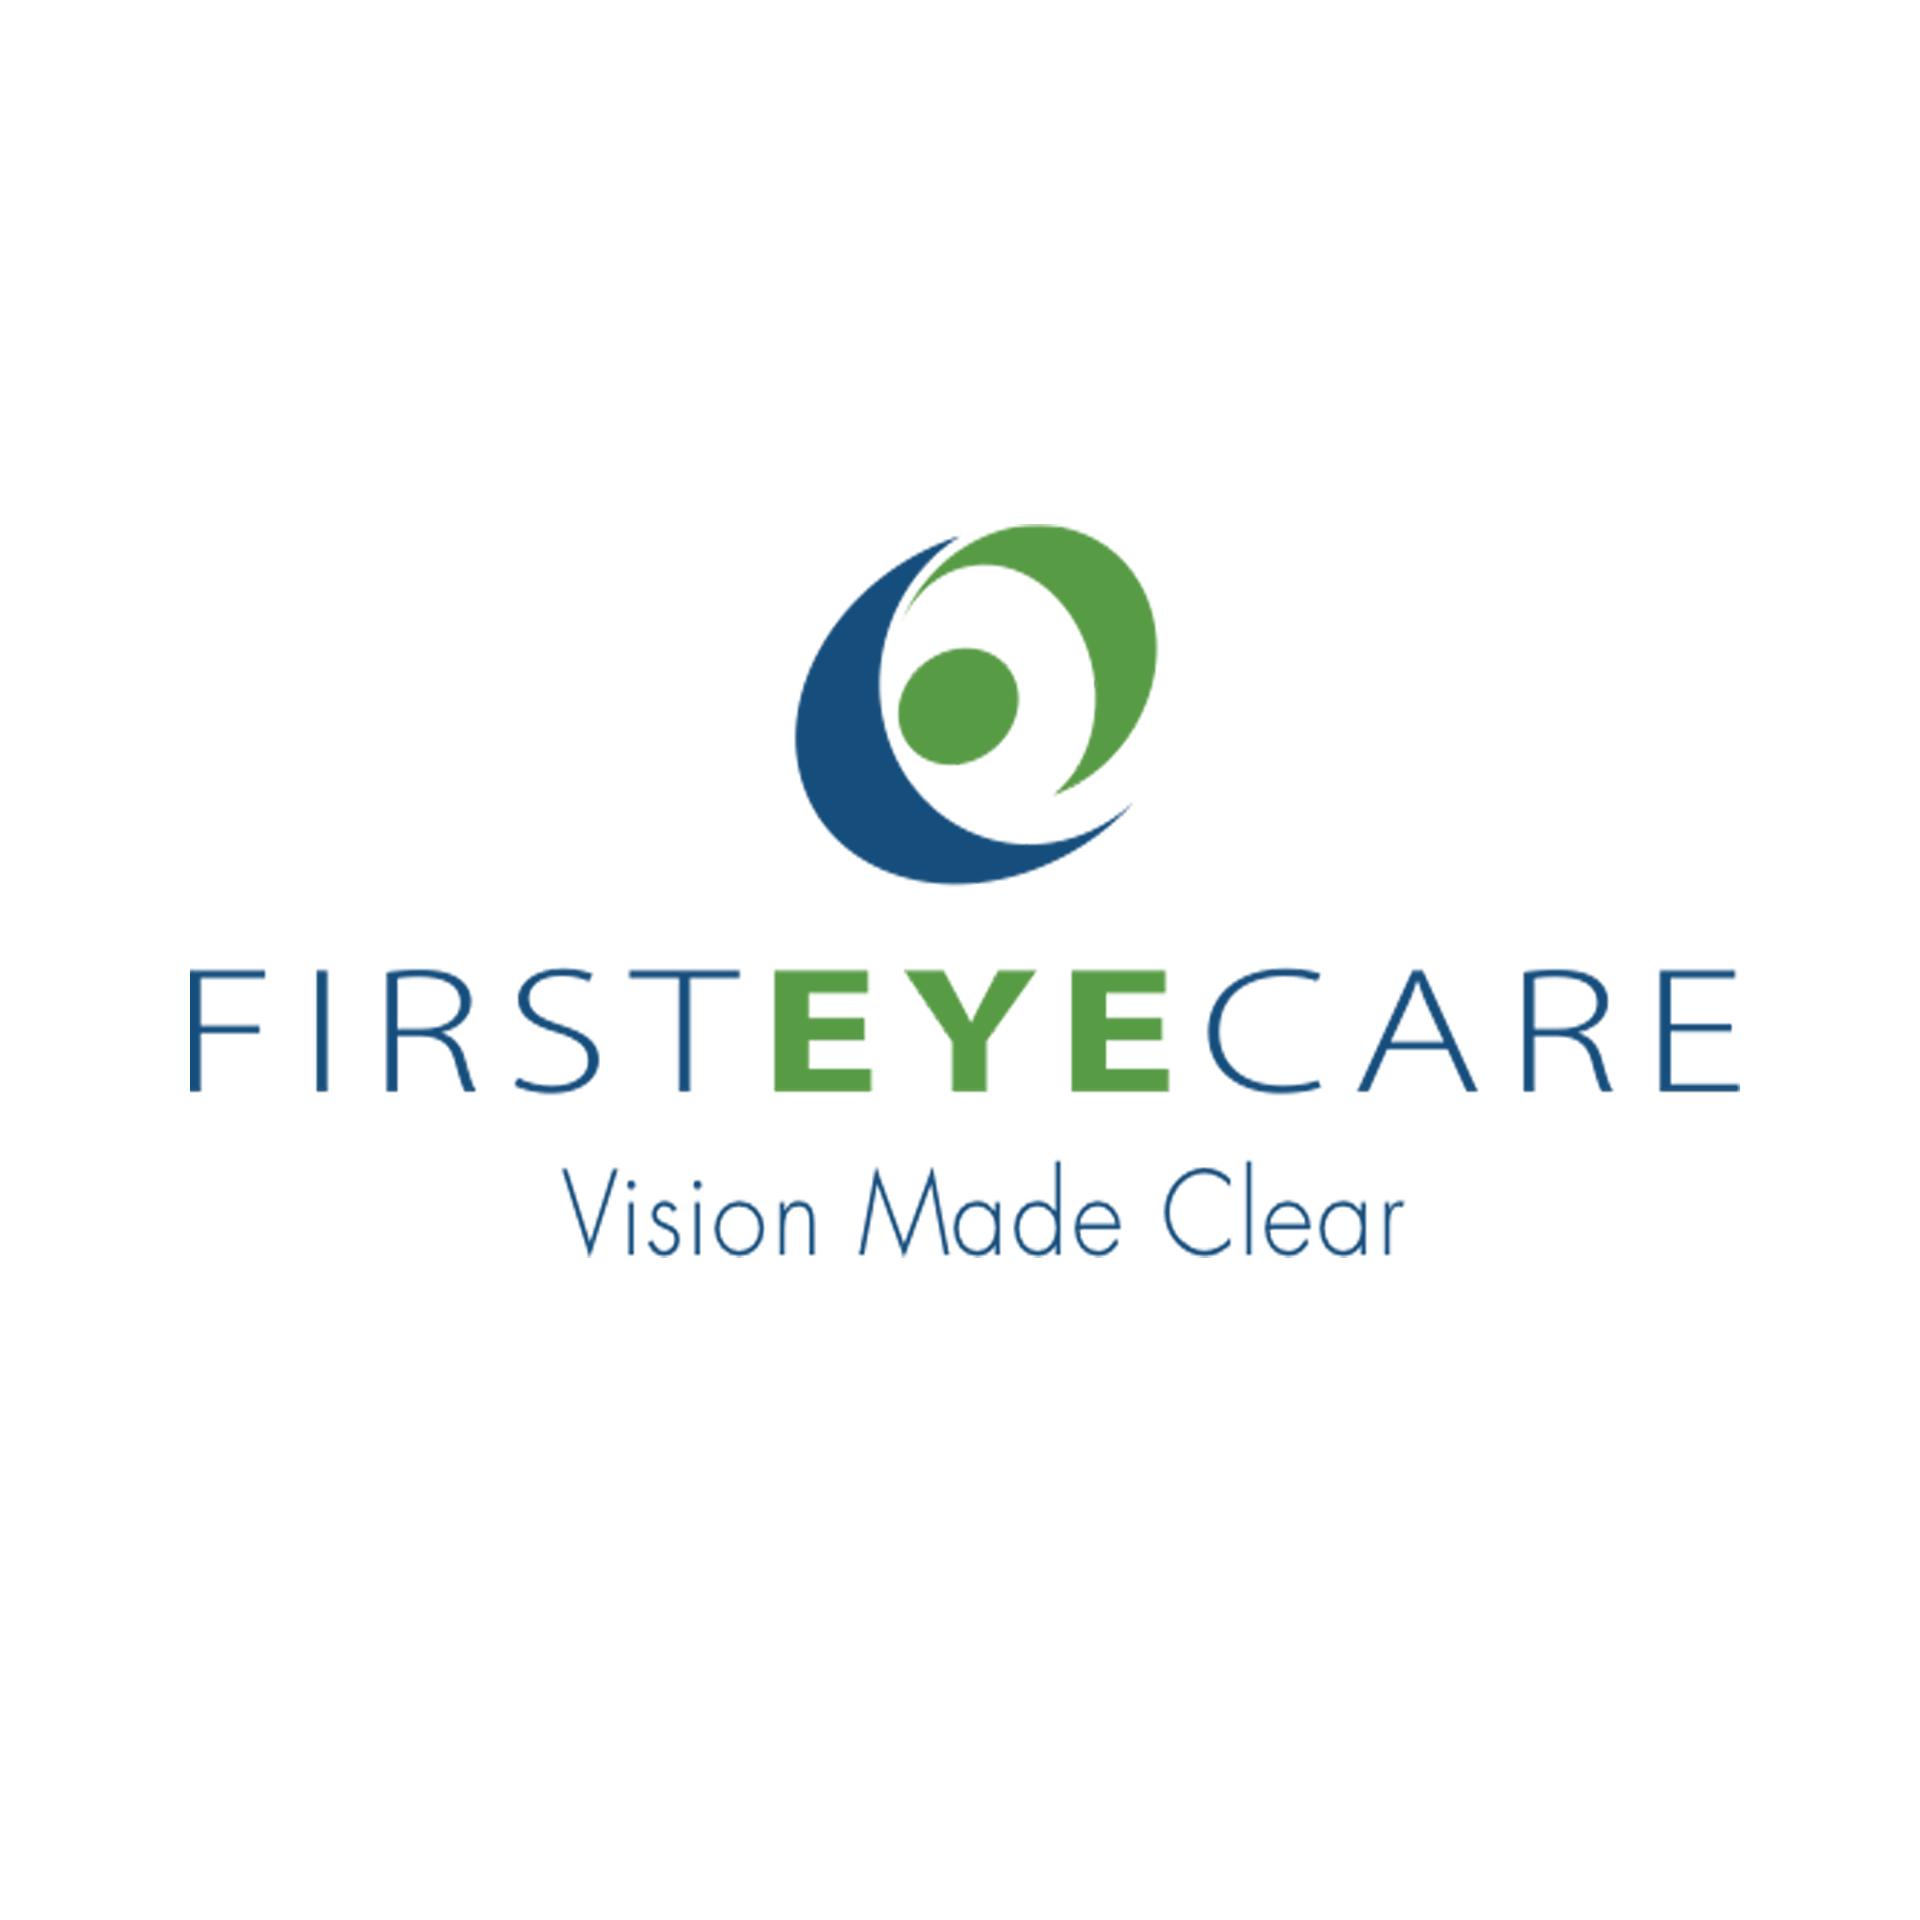 First Eye Care - Roanoke, TX 76262 - (817)491-2018 | ShowMeLocal.com